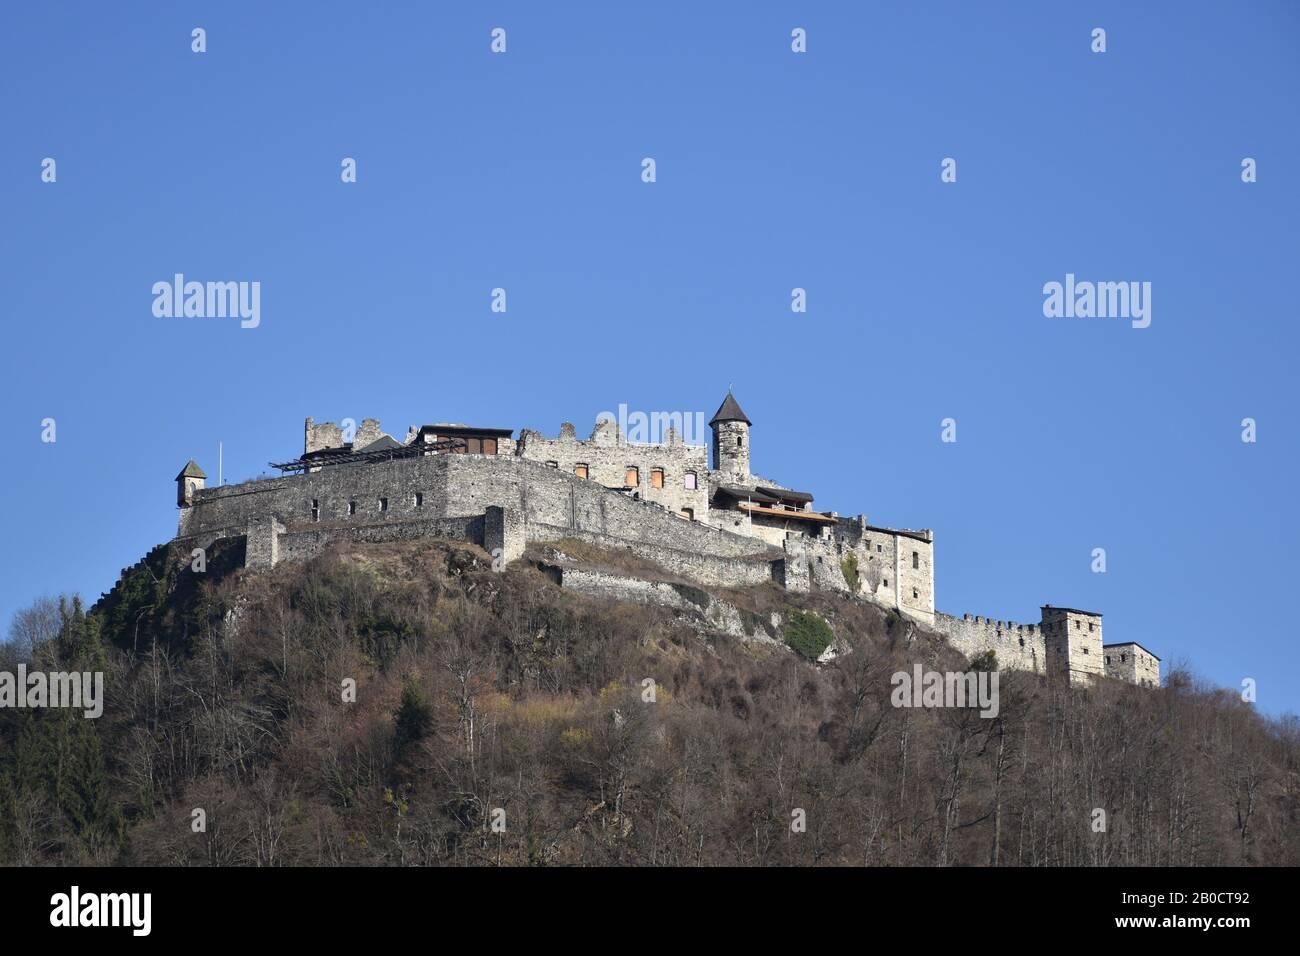 Burg Landskron, Landskron, Kärnten, Villach, Burgruine, Turm, Festung, Felsenburg, Ossiacher Tauern, Grad Vajškra, Mittelalter, Arena, Höhenburg Banque D'Images